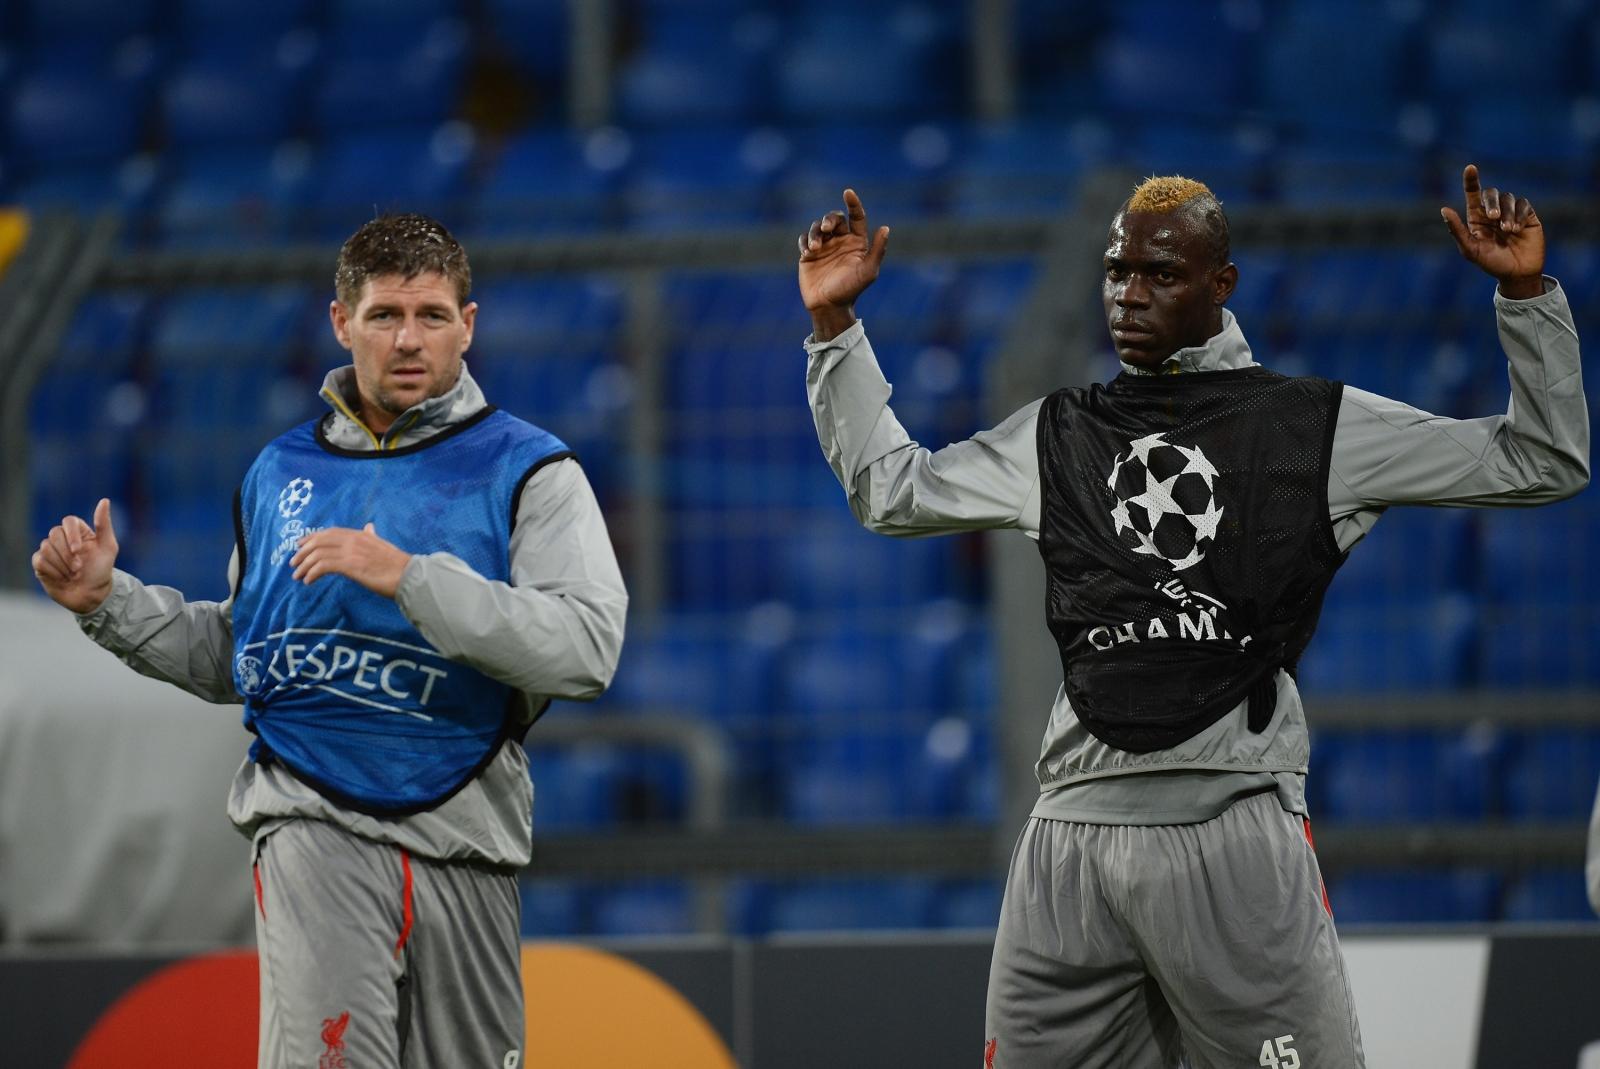 Balotelli and Gerrard